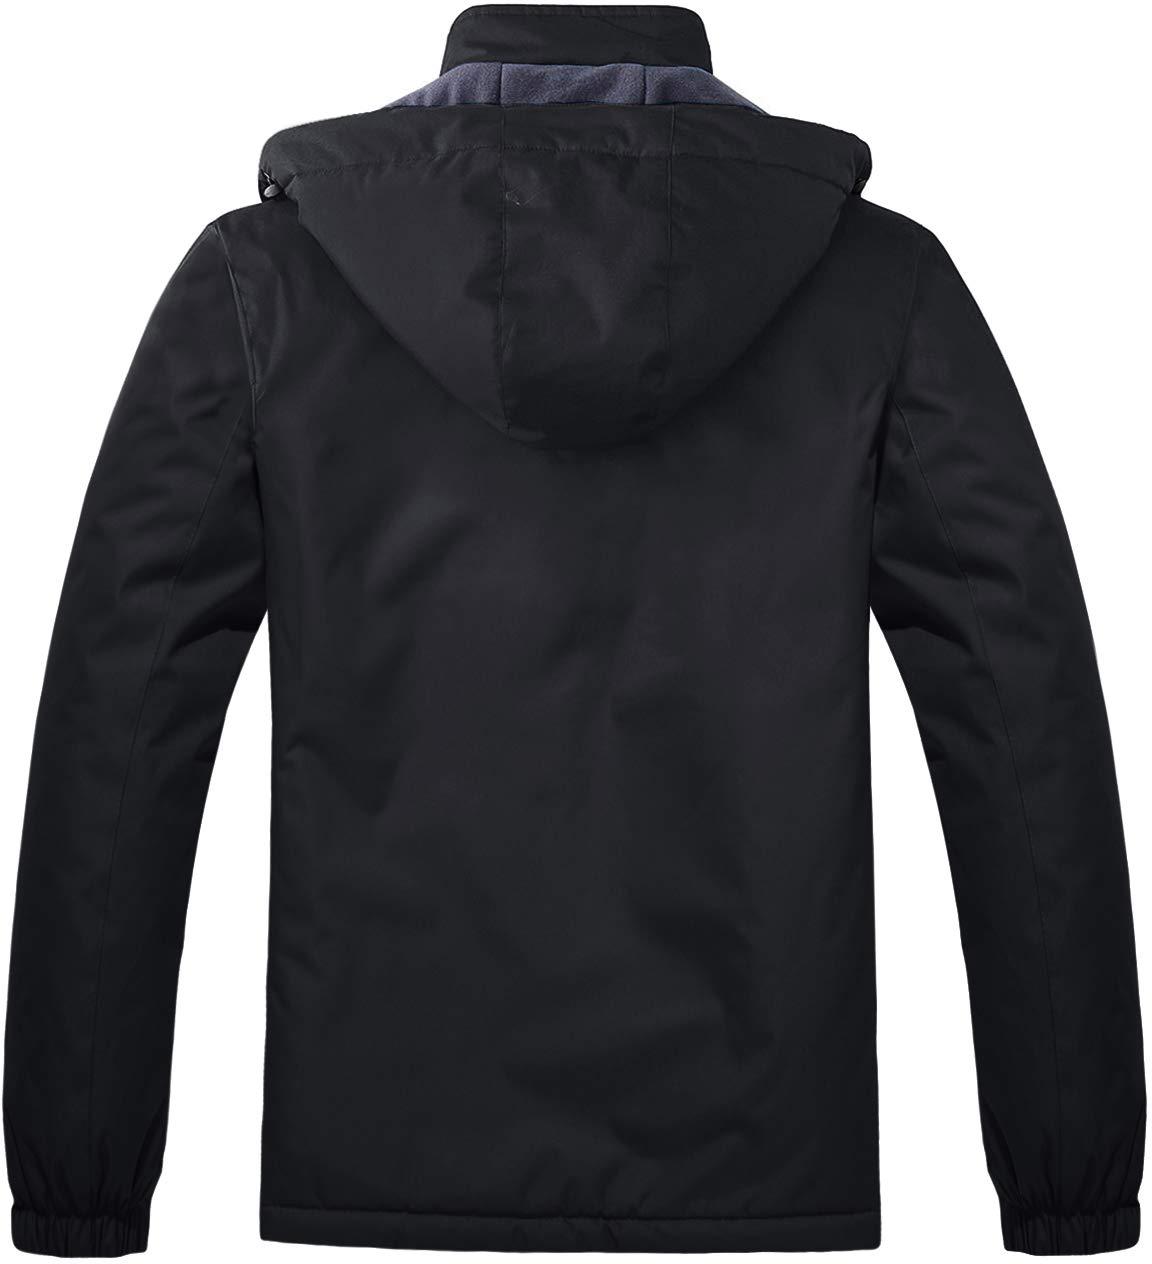 TACVASEN Women's Windproof Waterproof Jacket Softshell Warm Breathable Fleece Outdoor Coat with Detachable Hood